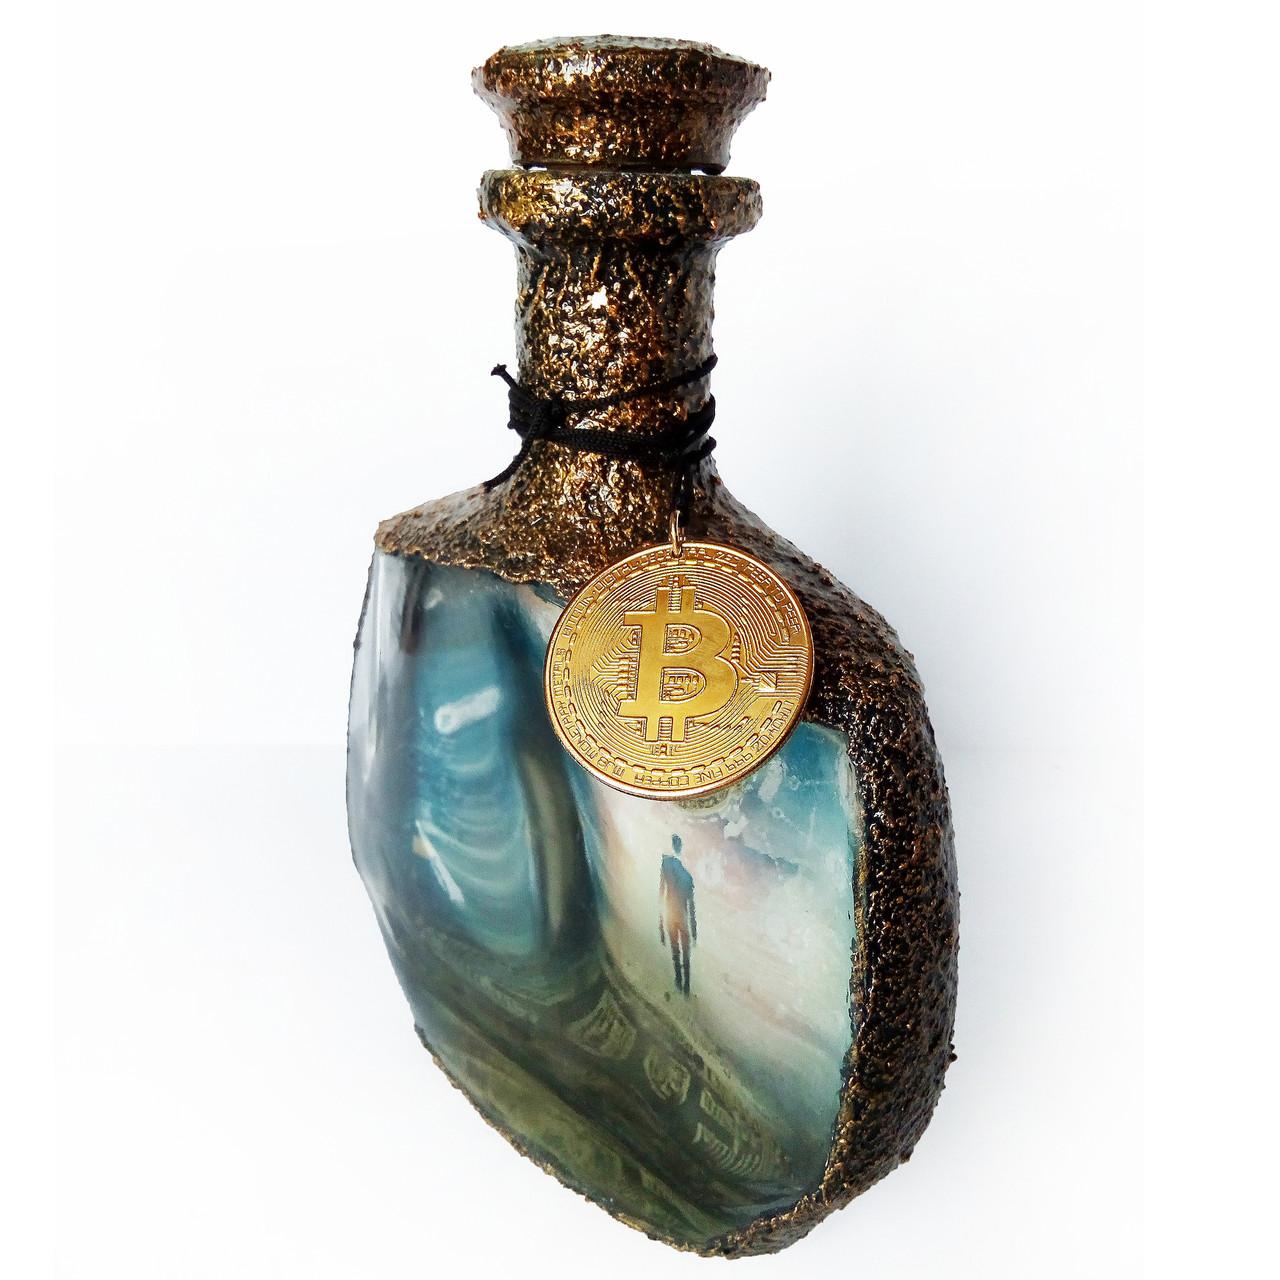 Сувенирная бутылка монета Биткоин Bitcoin Подарок мужчине ...